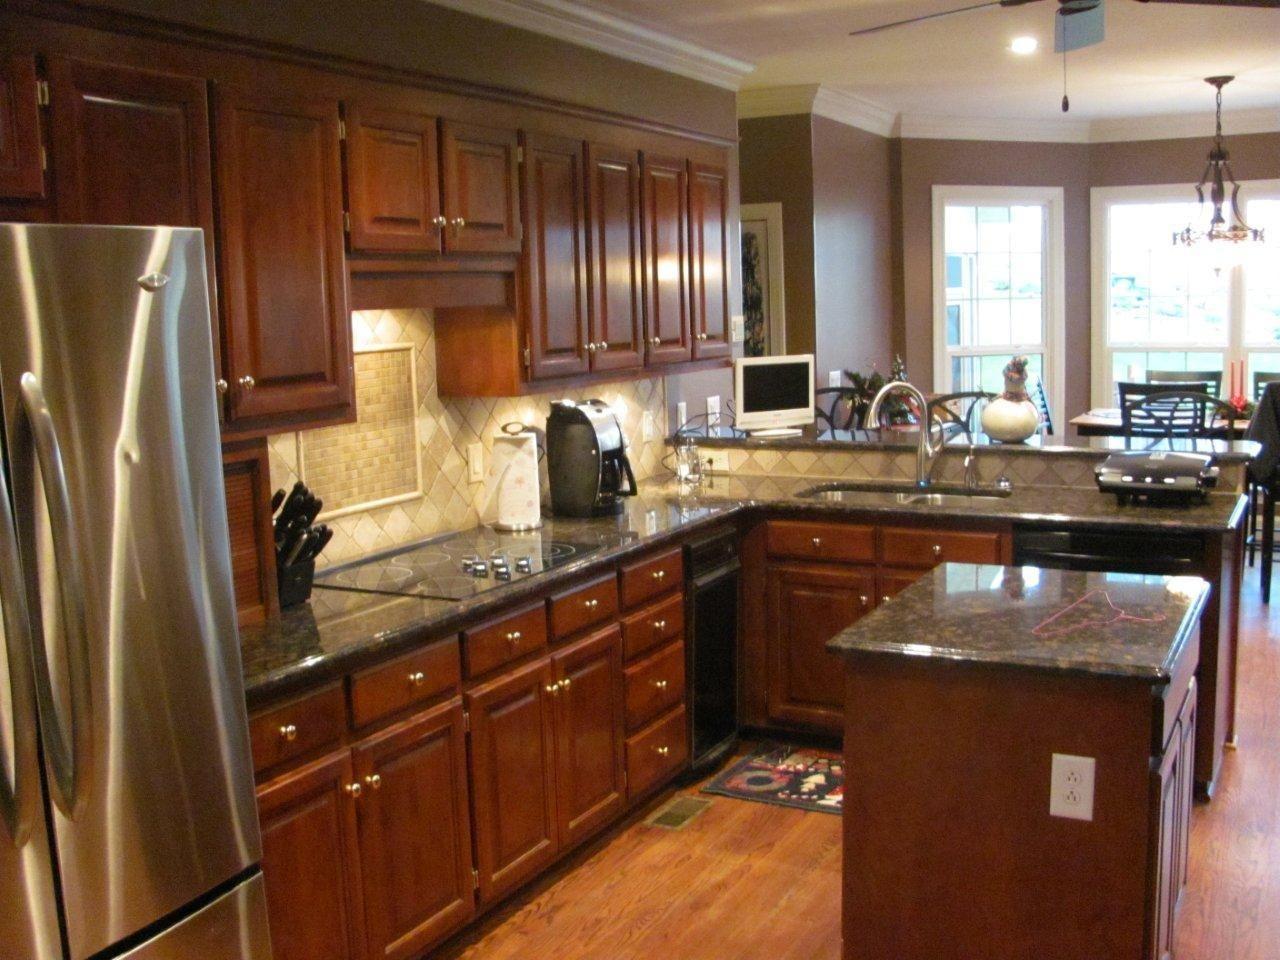 Remodeled Kitchens  Kitchen Remodel In Charlotte With Eatin Fascinating Remodeling Kitchen Design Ideas